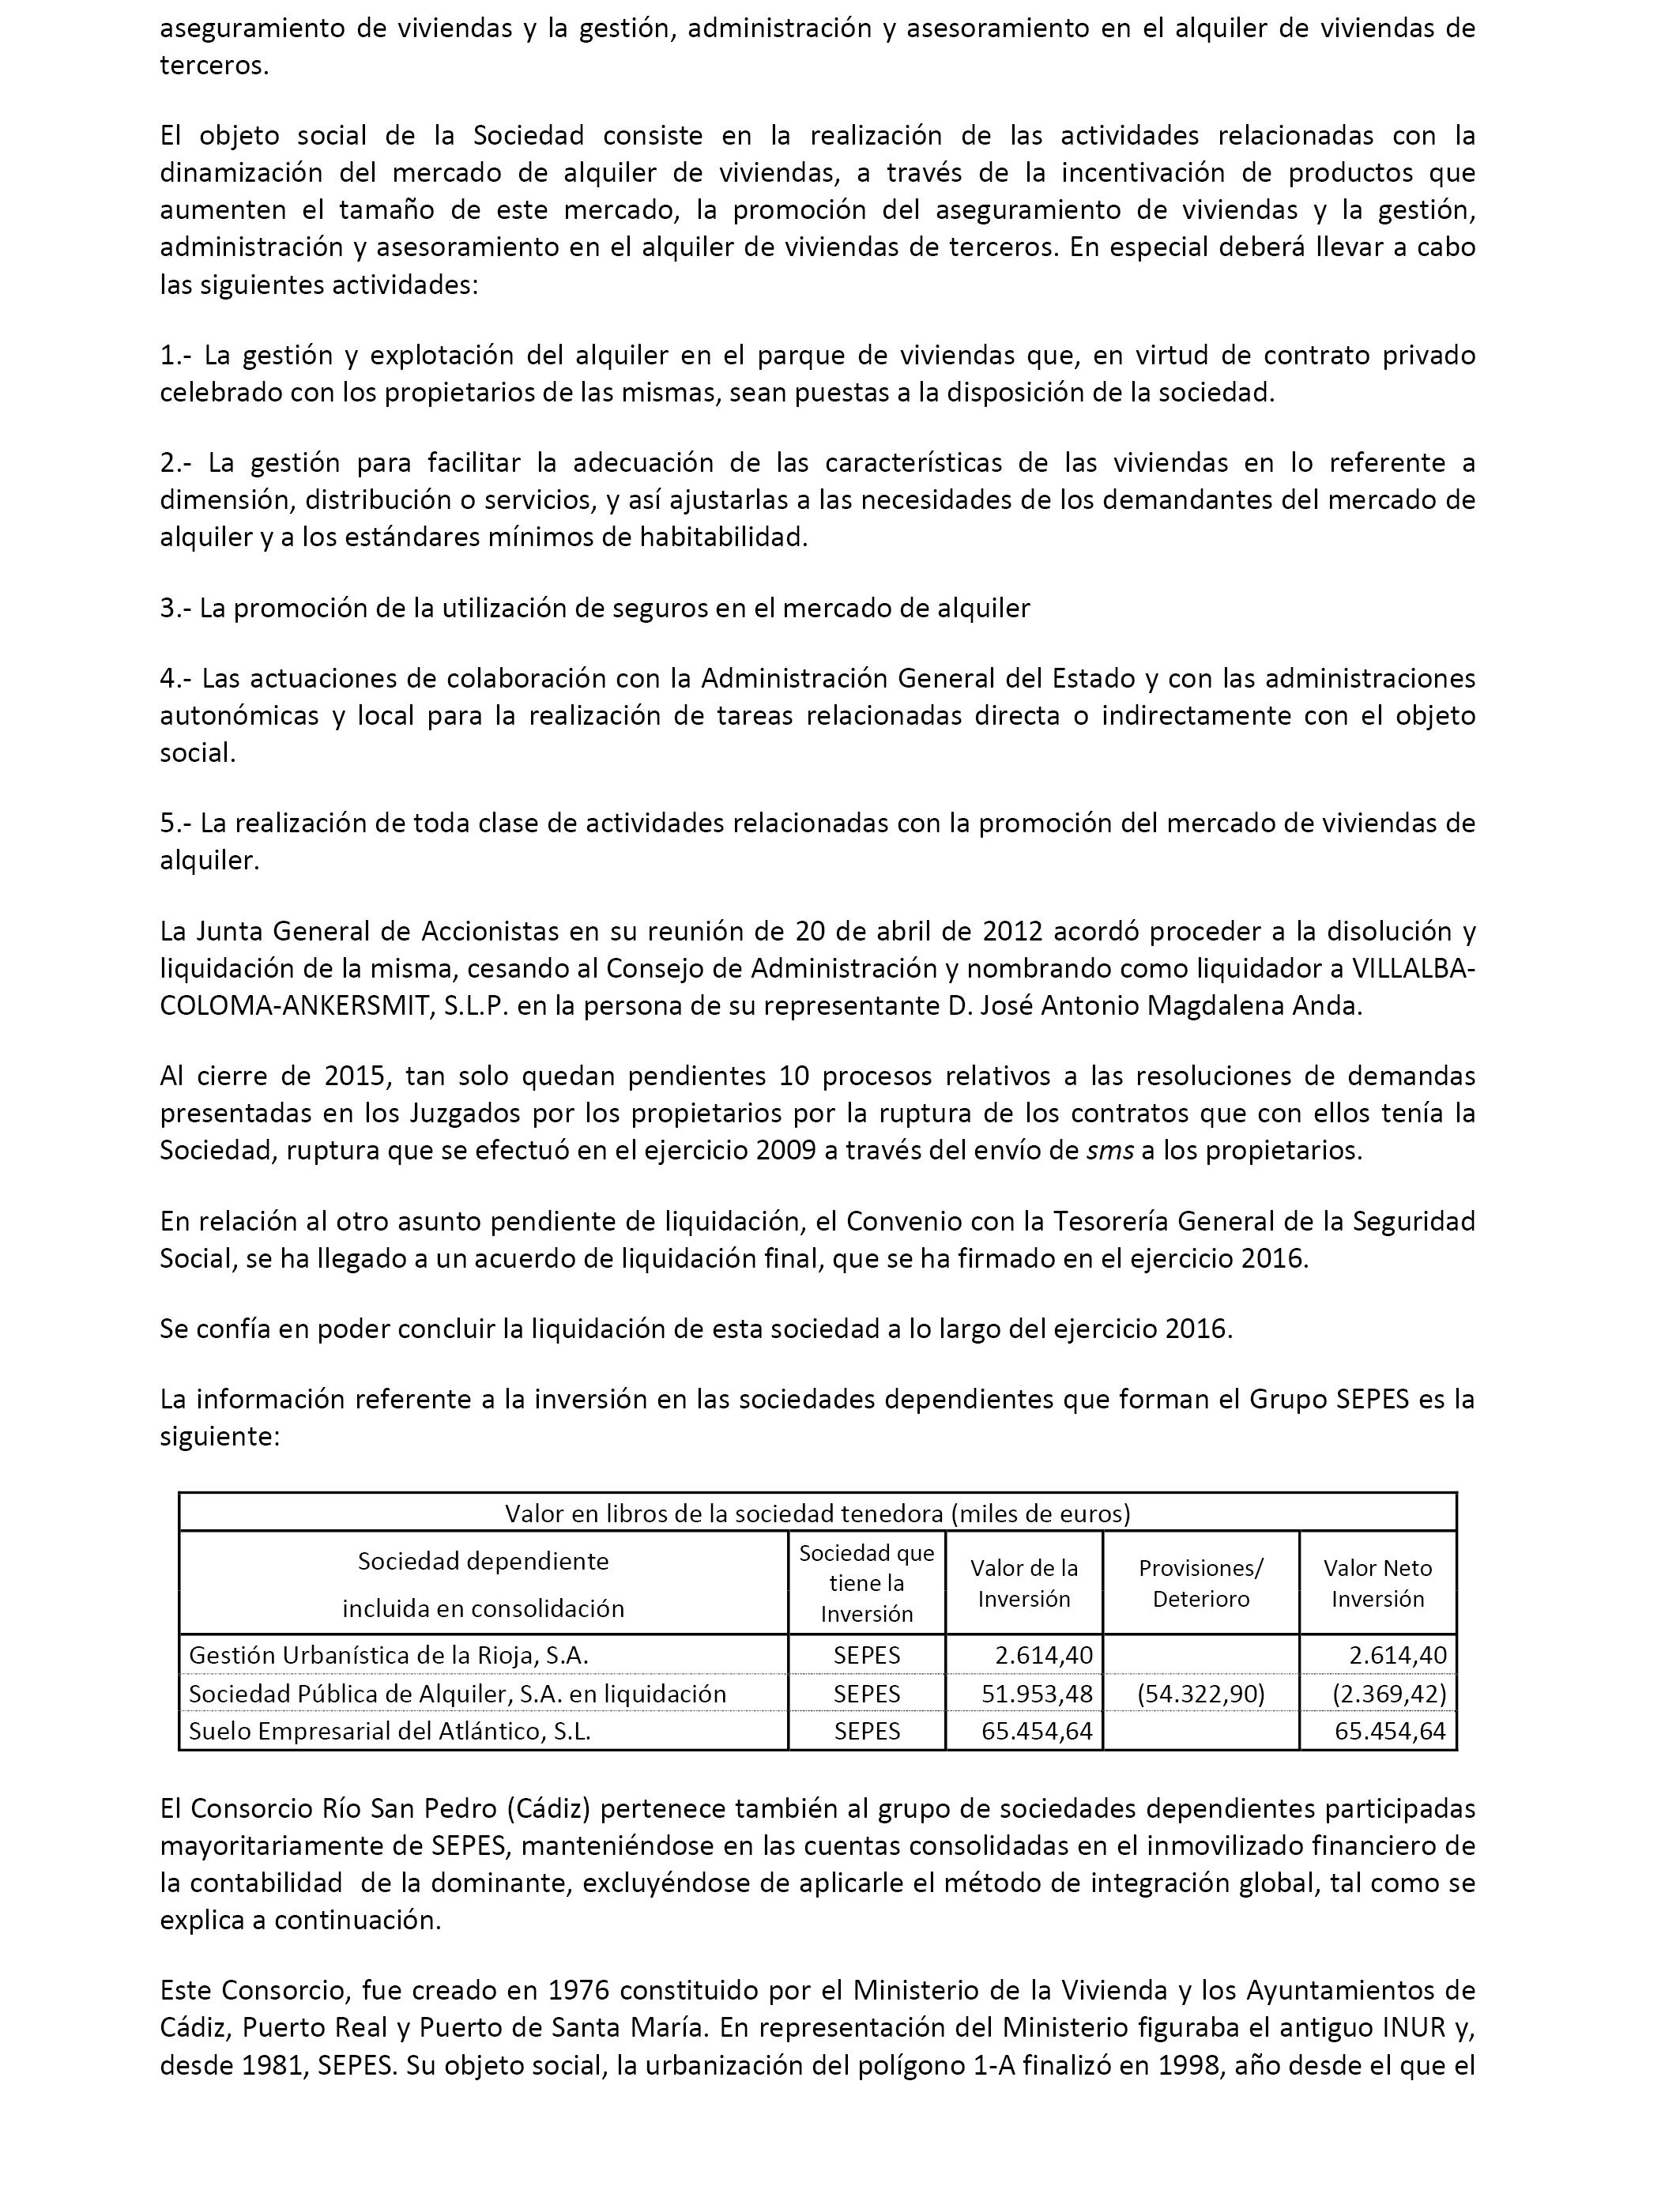 BOE.es - Documento BOE-A-2016-10447